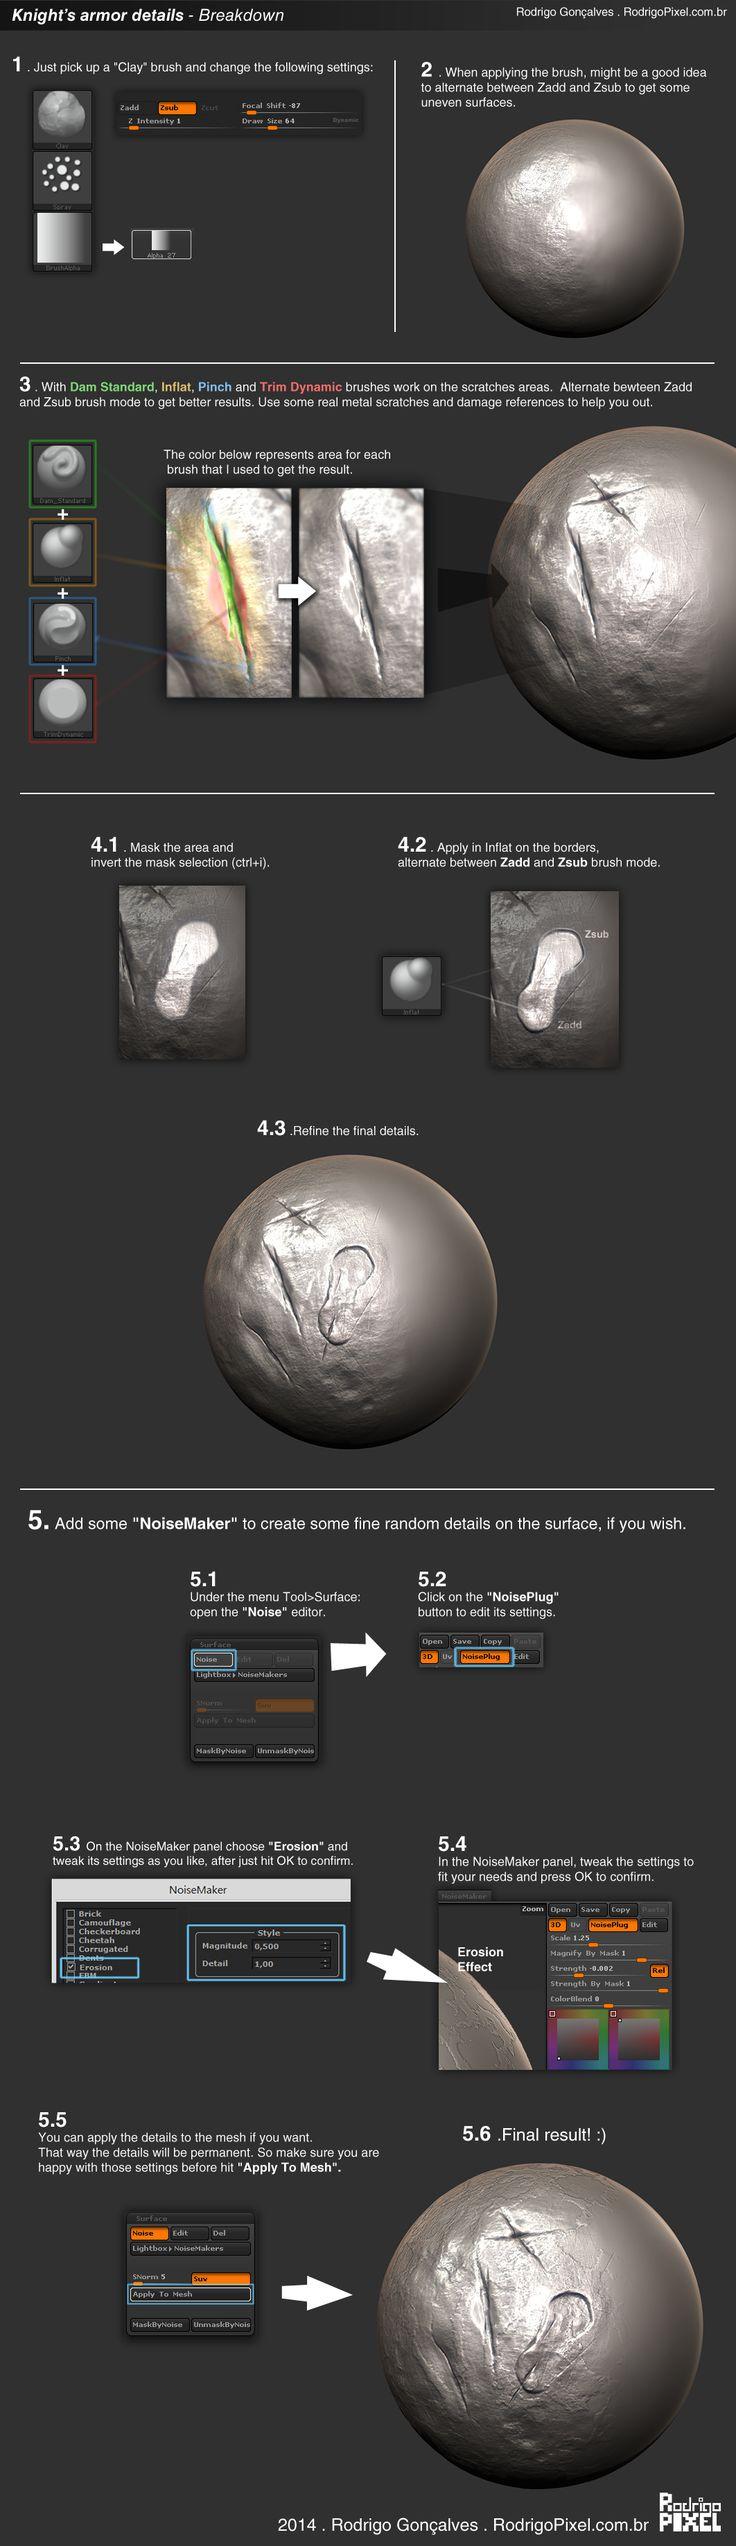 armor_details_breakdown.jpg 1,062×3,674 pixels